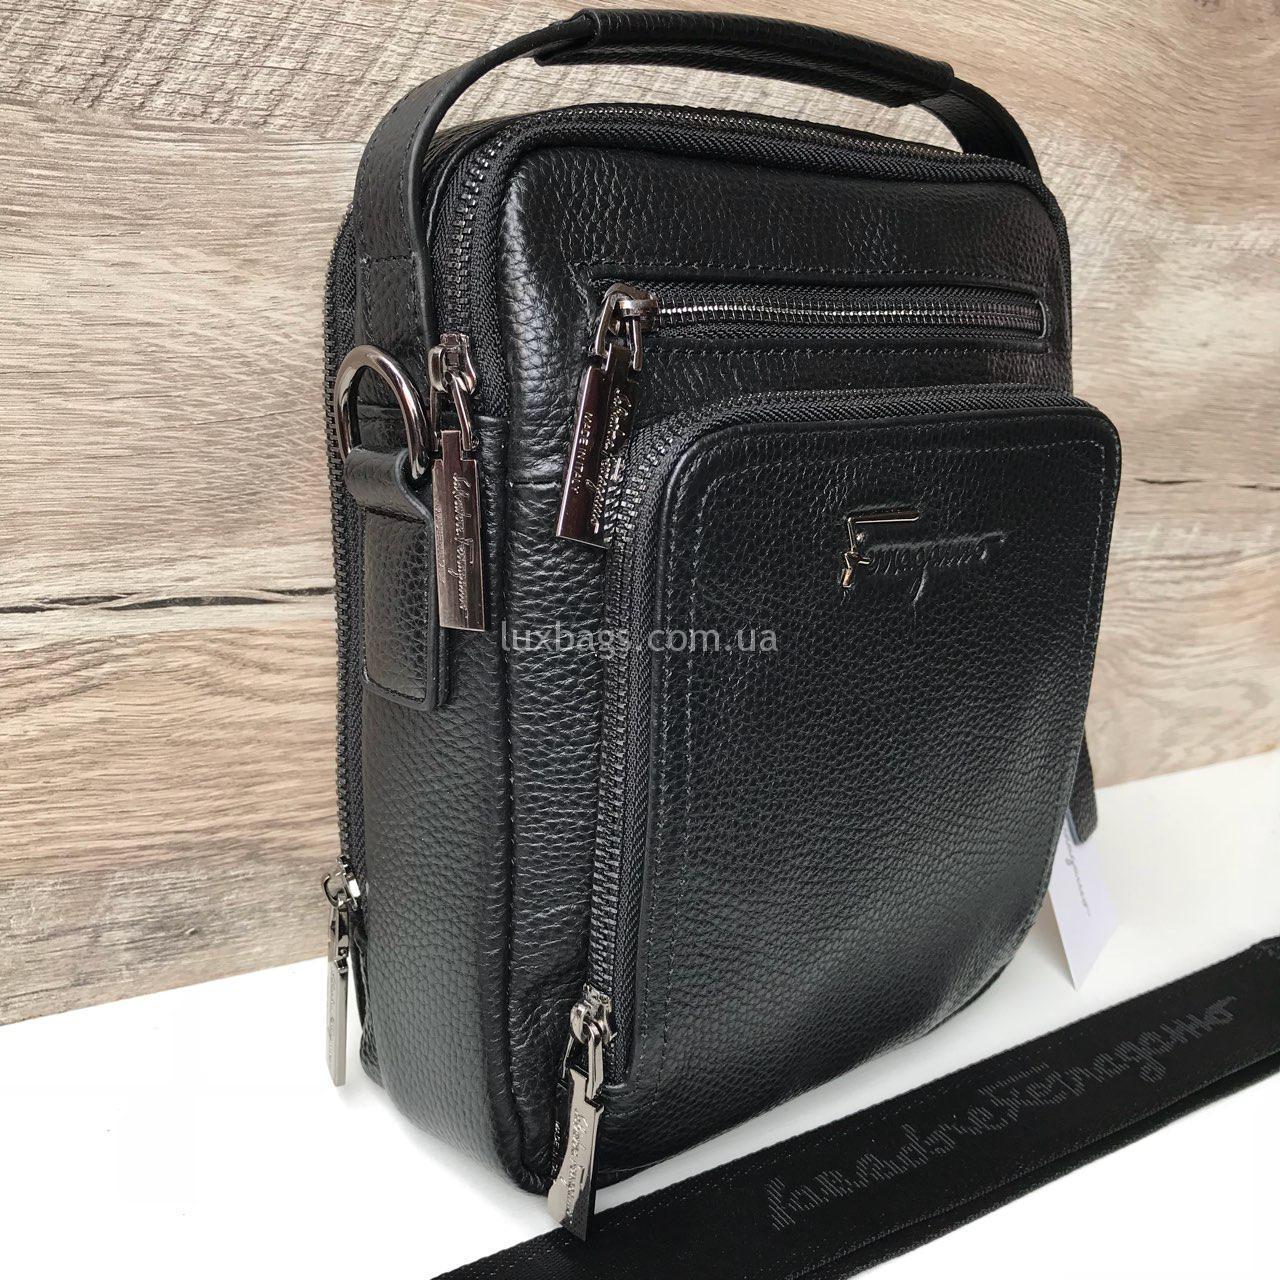 8749c4b9e409 Мужская кожаная барсетка/ сумка через плечо Salvatore Ferragamo